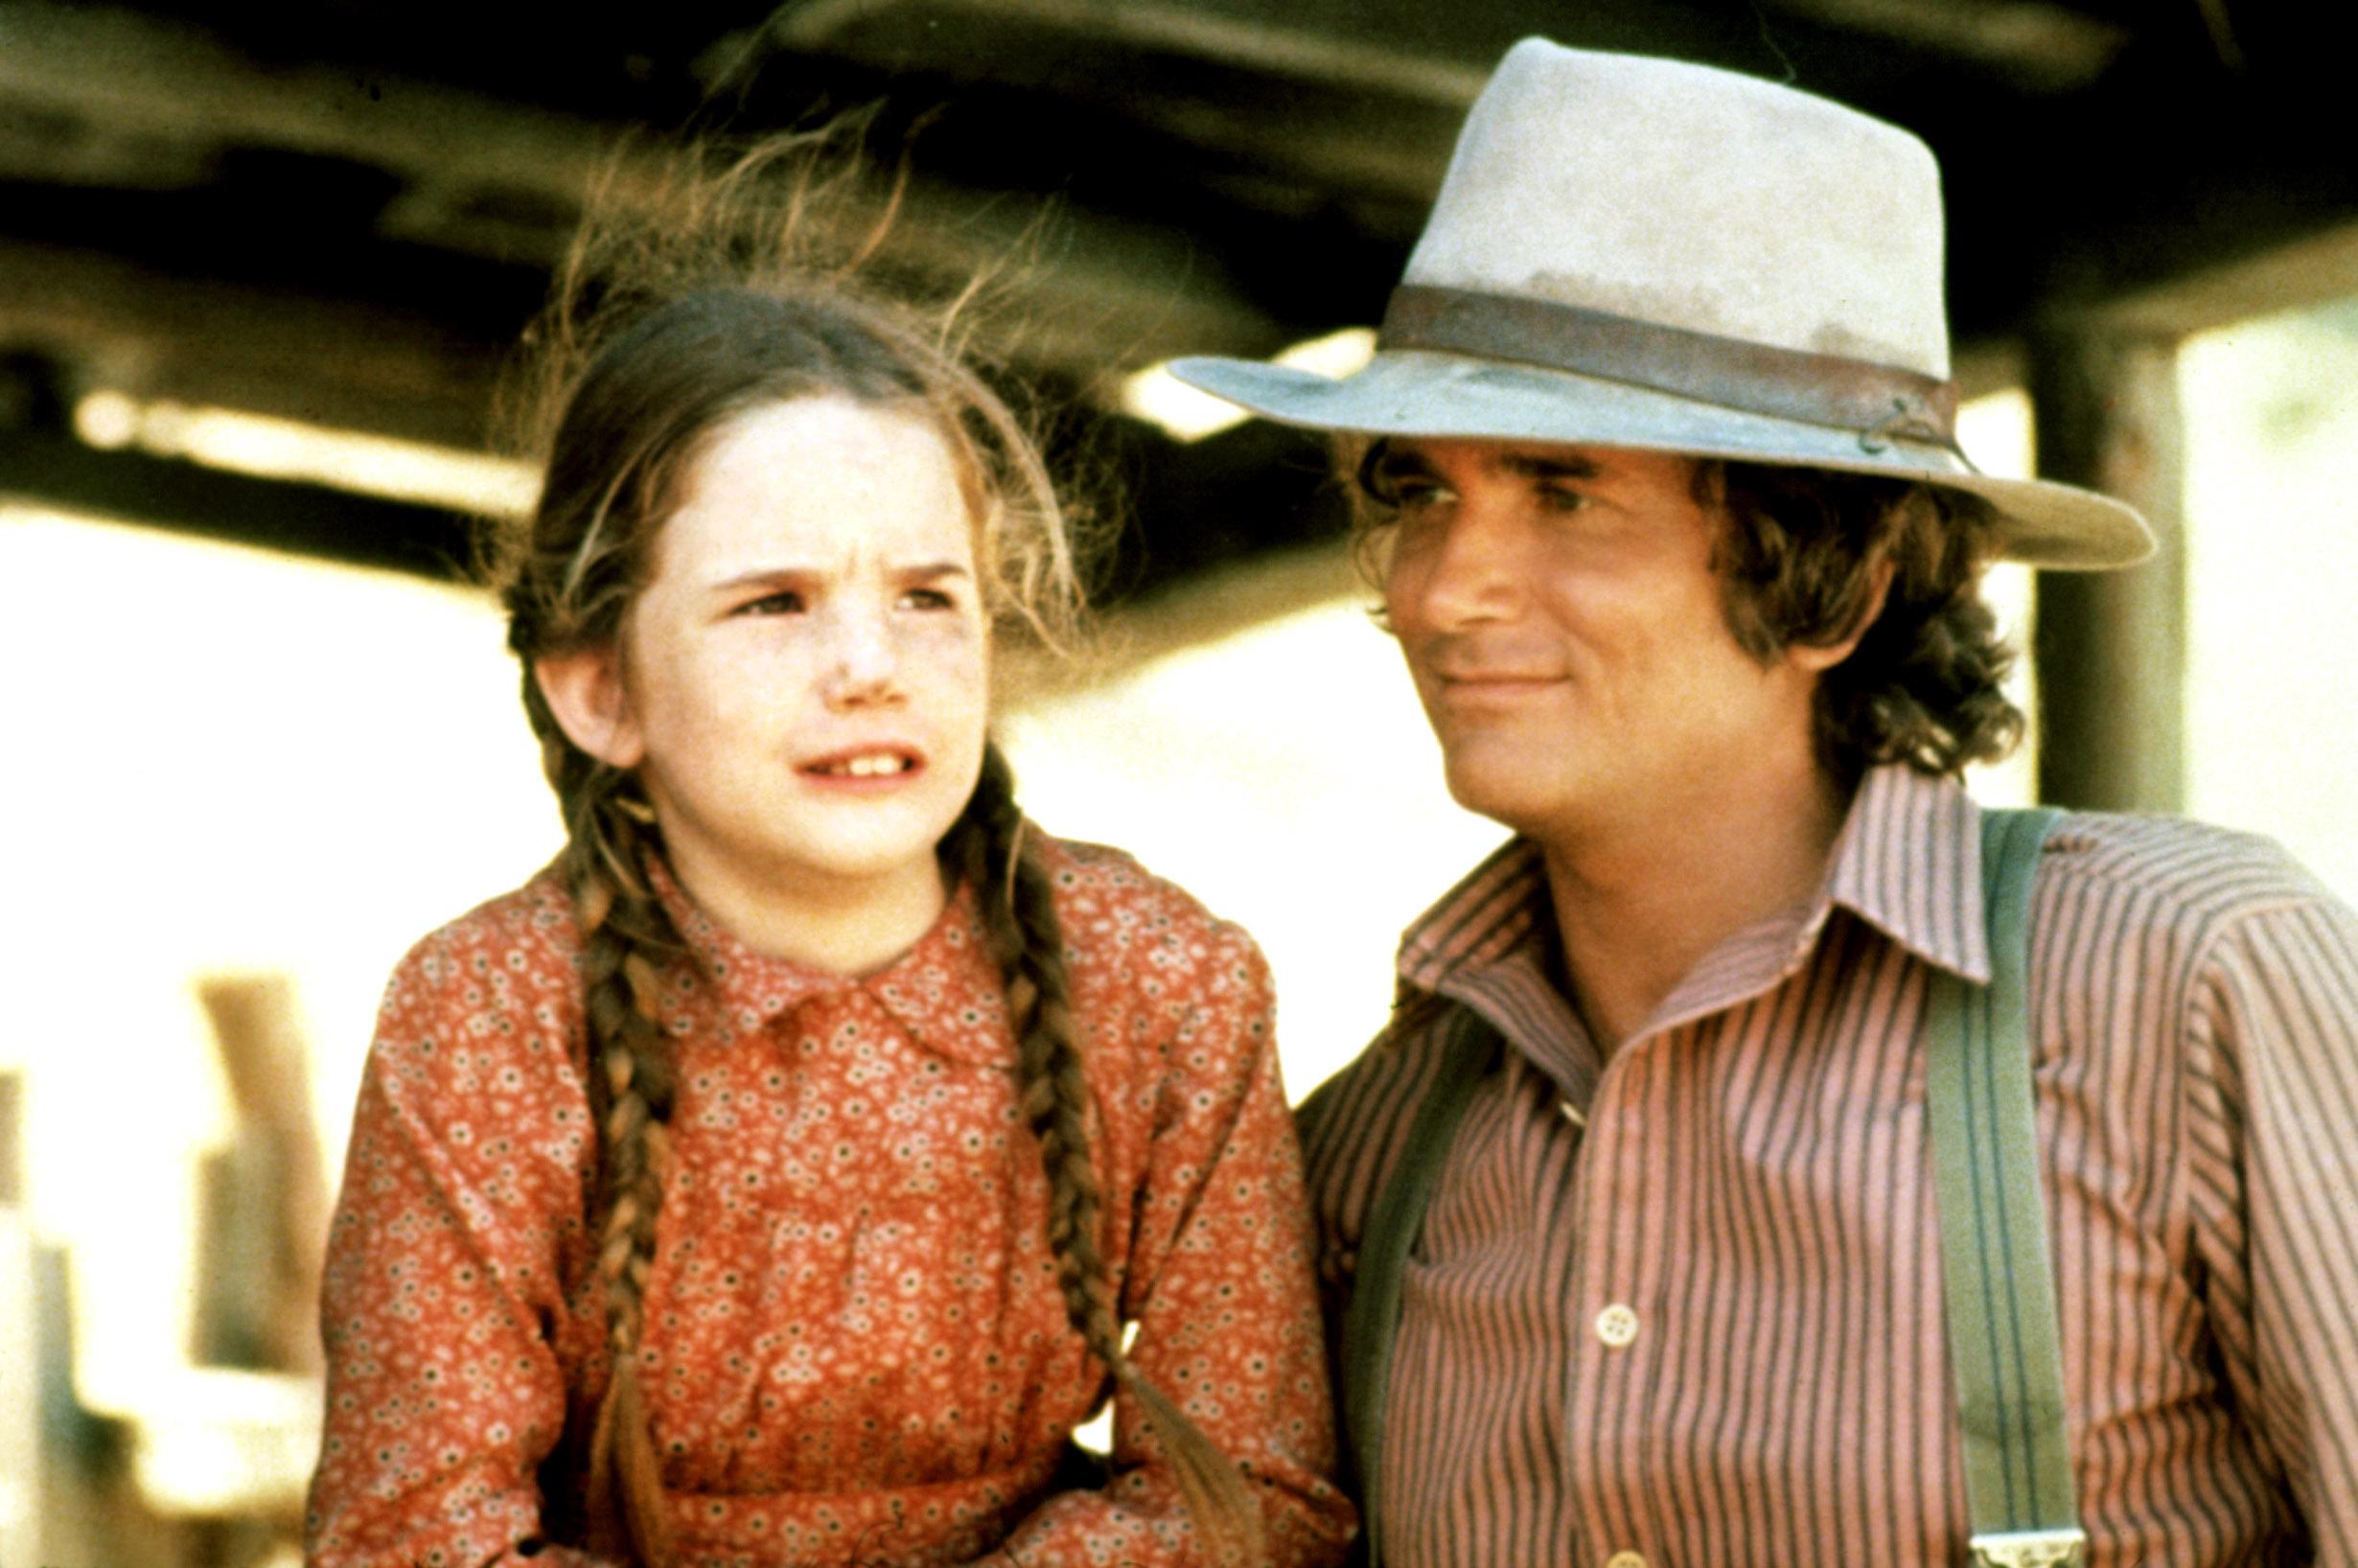 LITTLE HOUSE ON THE PRAIRIE, Melissa Gilbert, Michael Landon, 1973-84